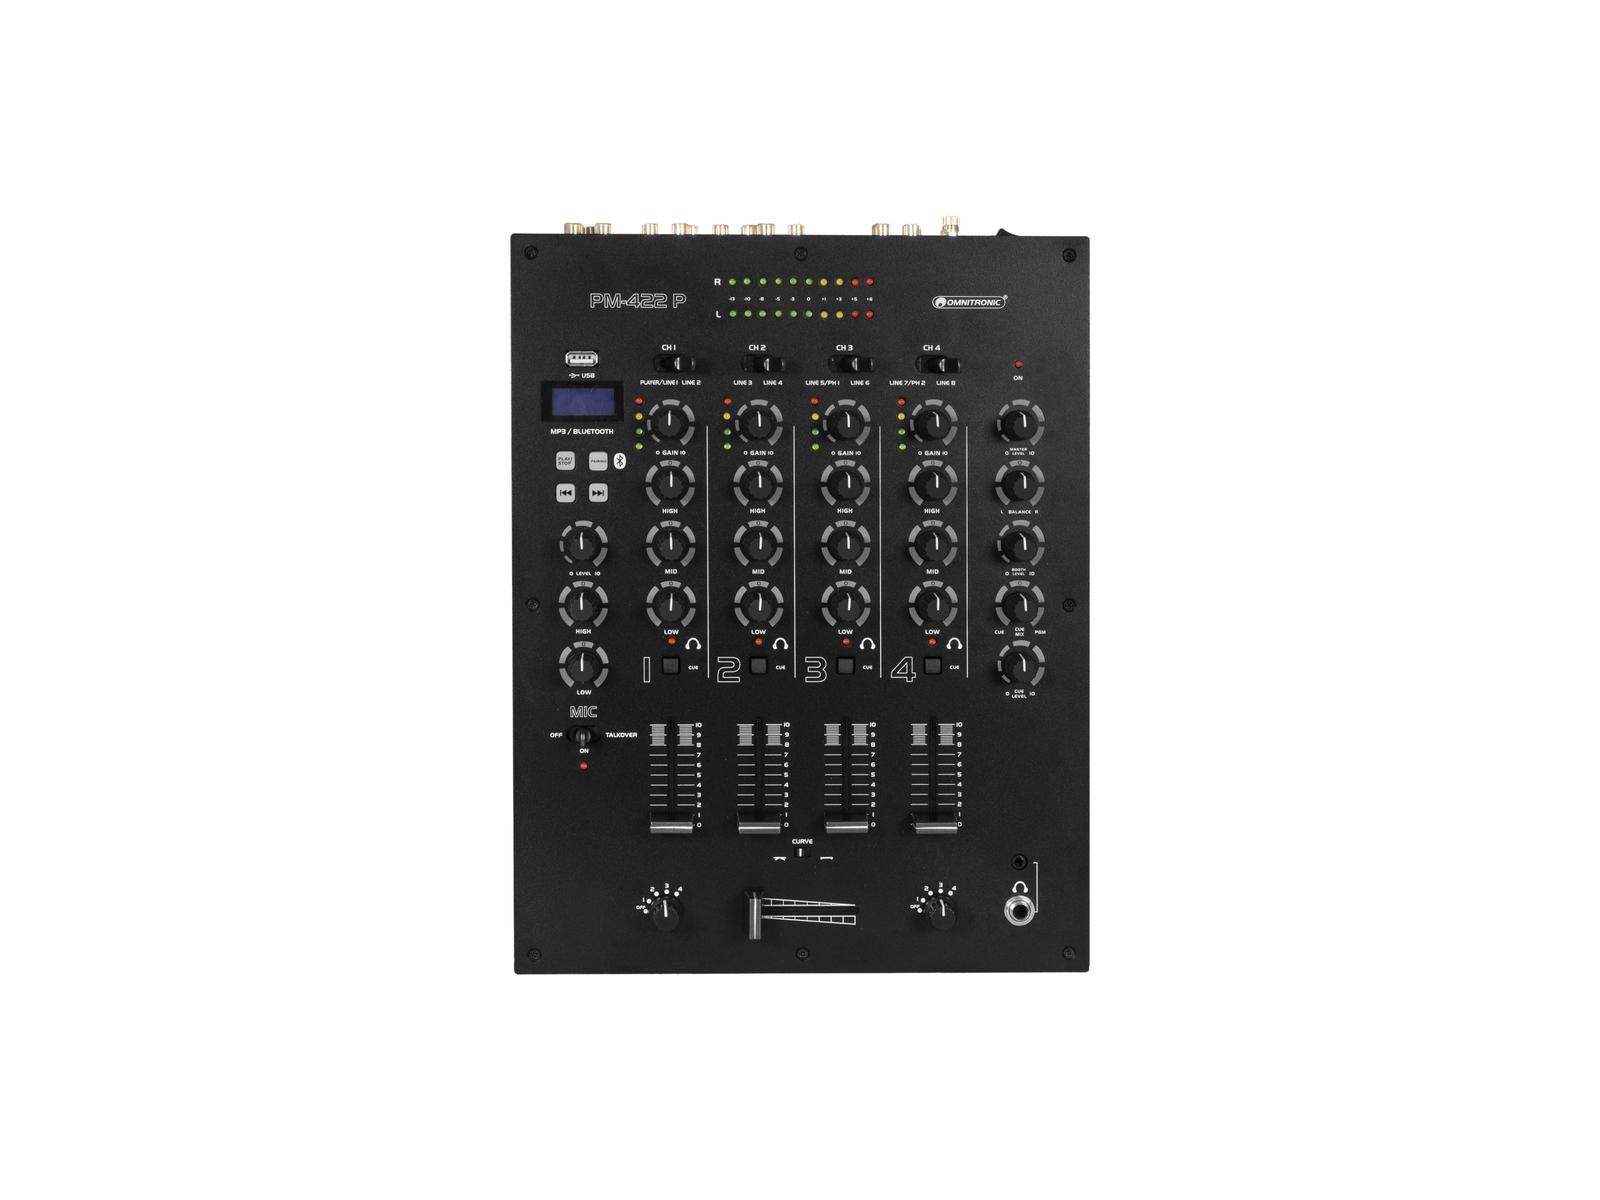 OMNITRONIC PM-422P 4-Kanal-DJ-Mixer mit Bluetooth und USB-Player